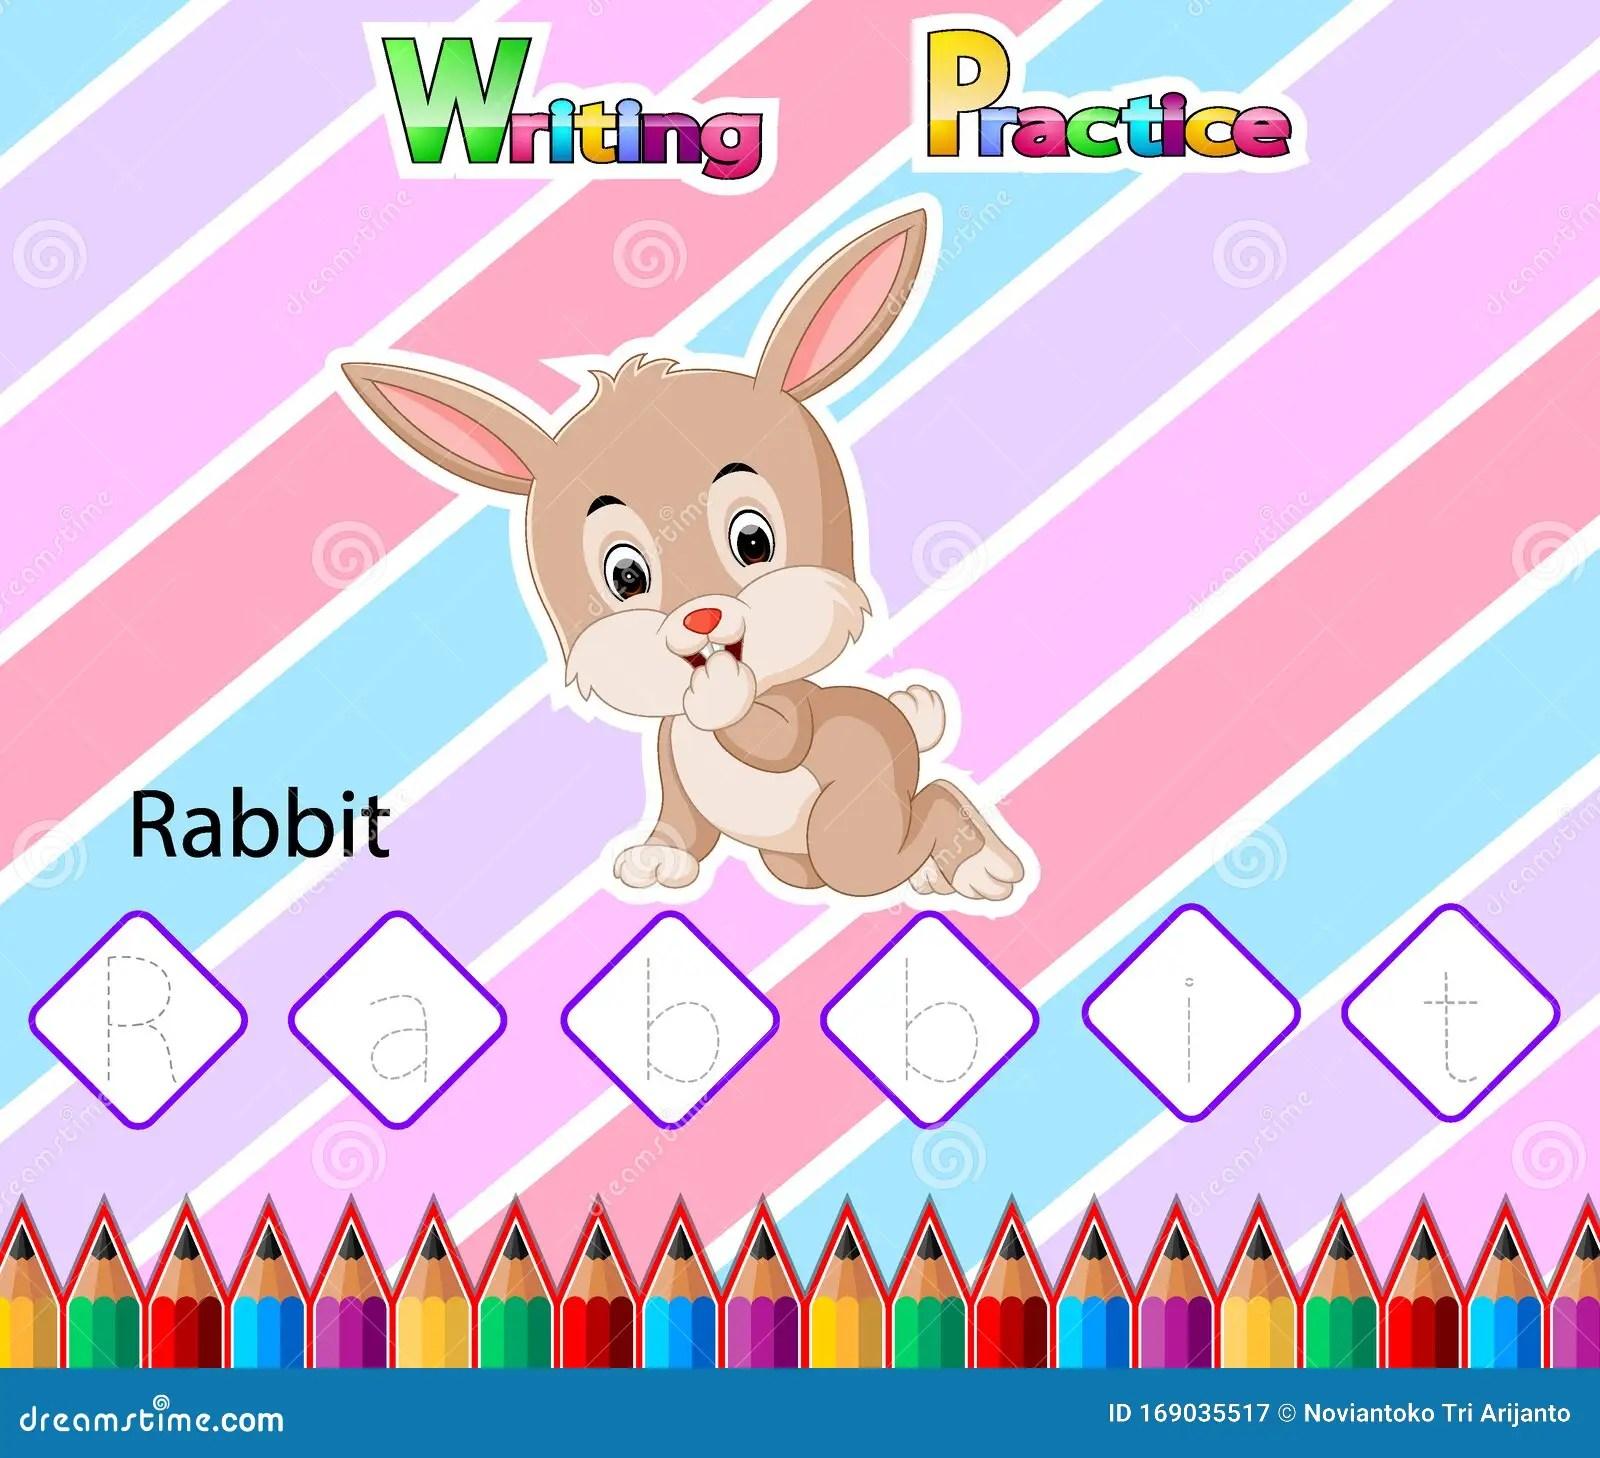 Worksheet Writing Practice Alphabet R For Rabbit Stock